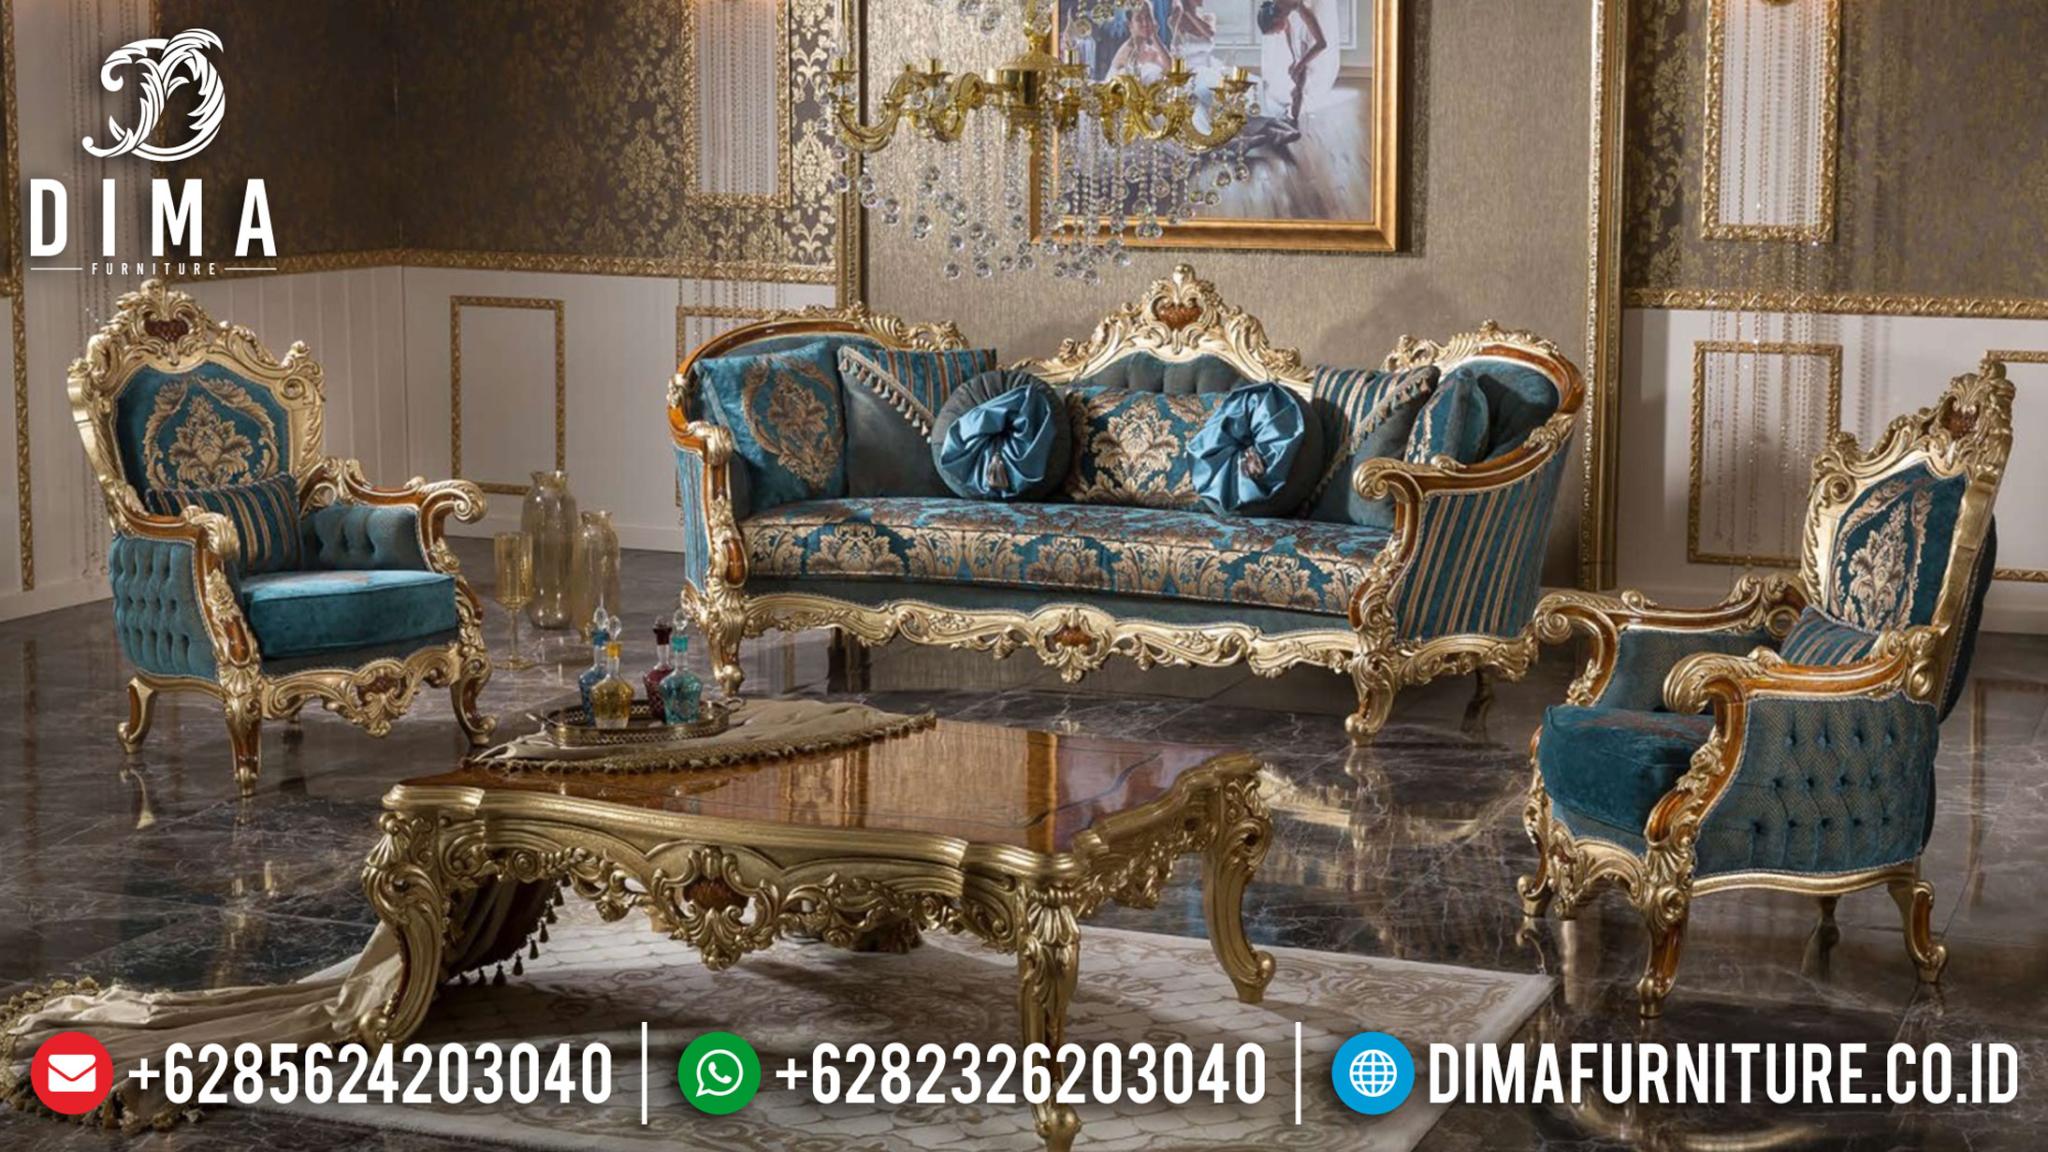 Harga Sofa Tamu Jepara Natural Combine Luxury Classic Style New Design 2020 MMJ-0941